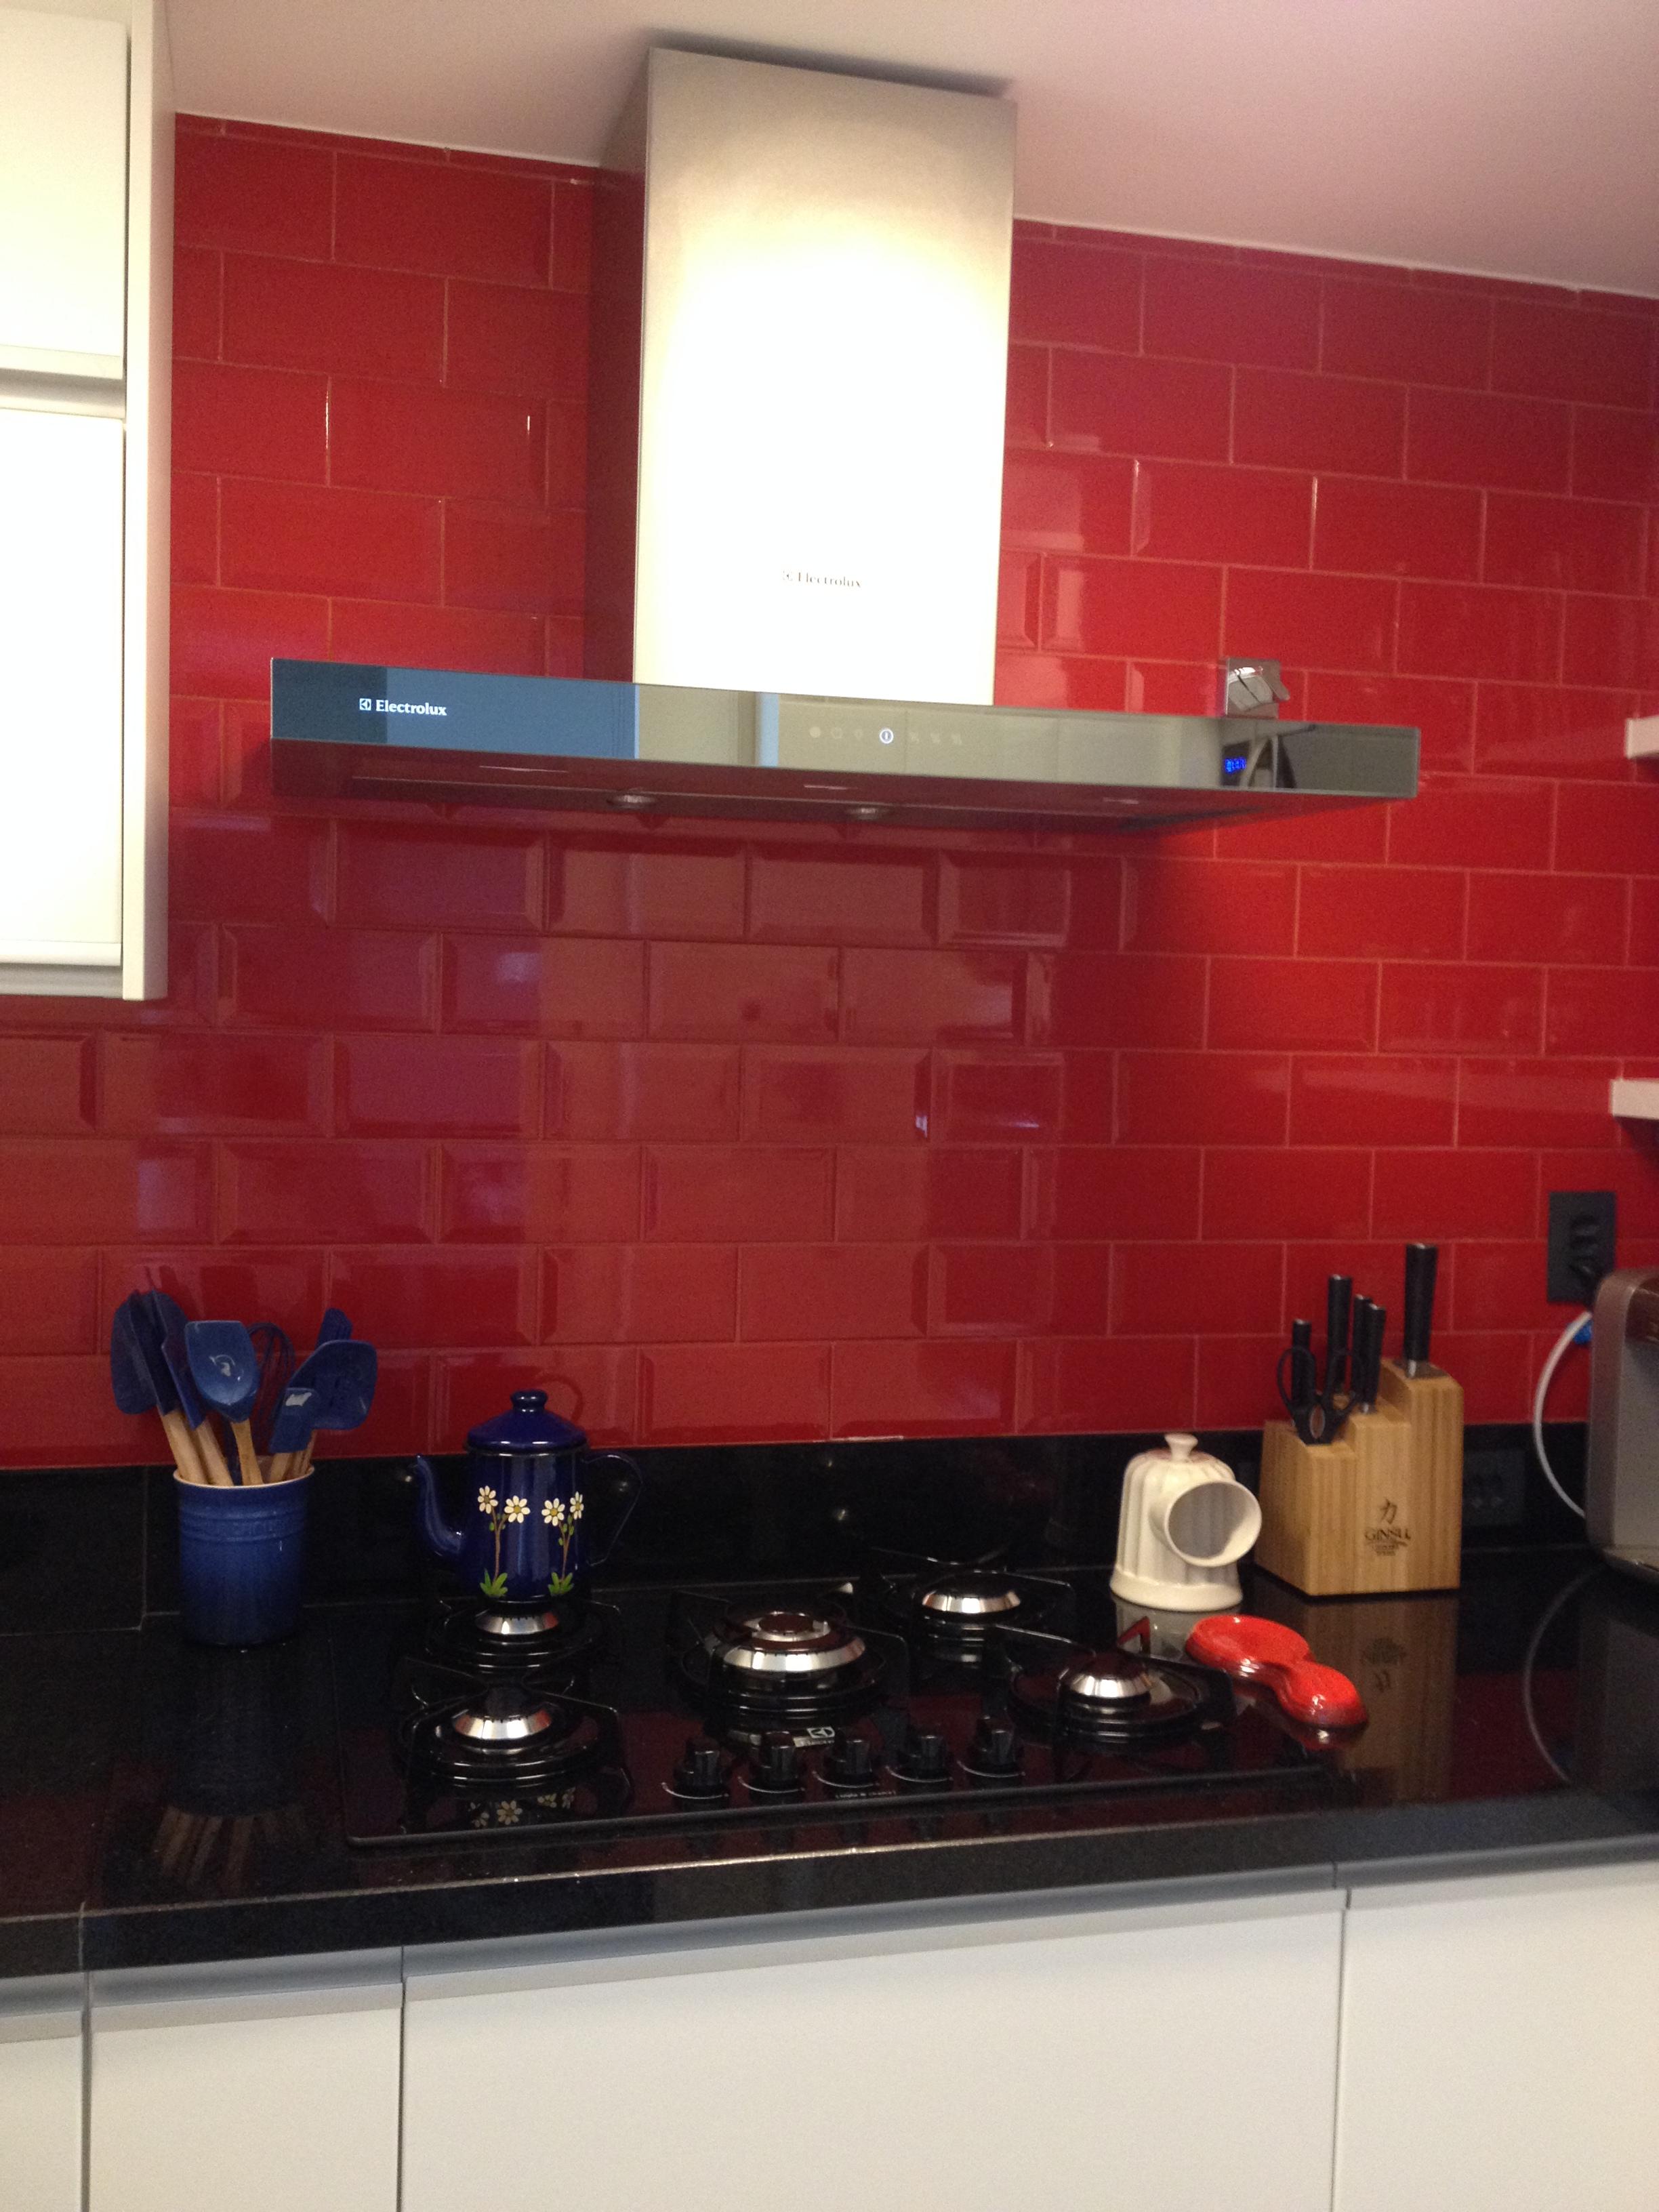 detalhe cozinha.JPG